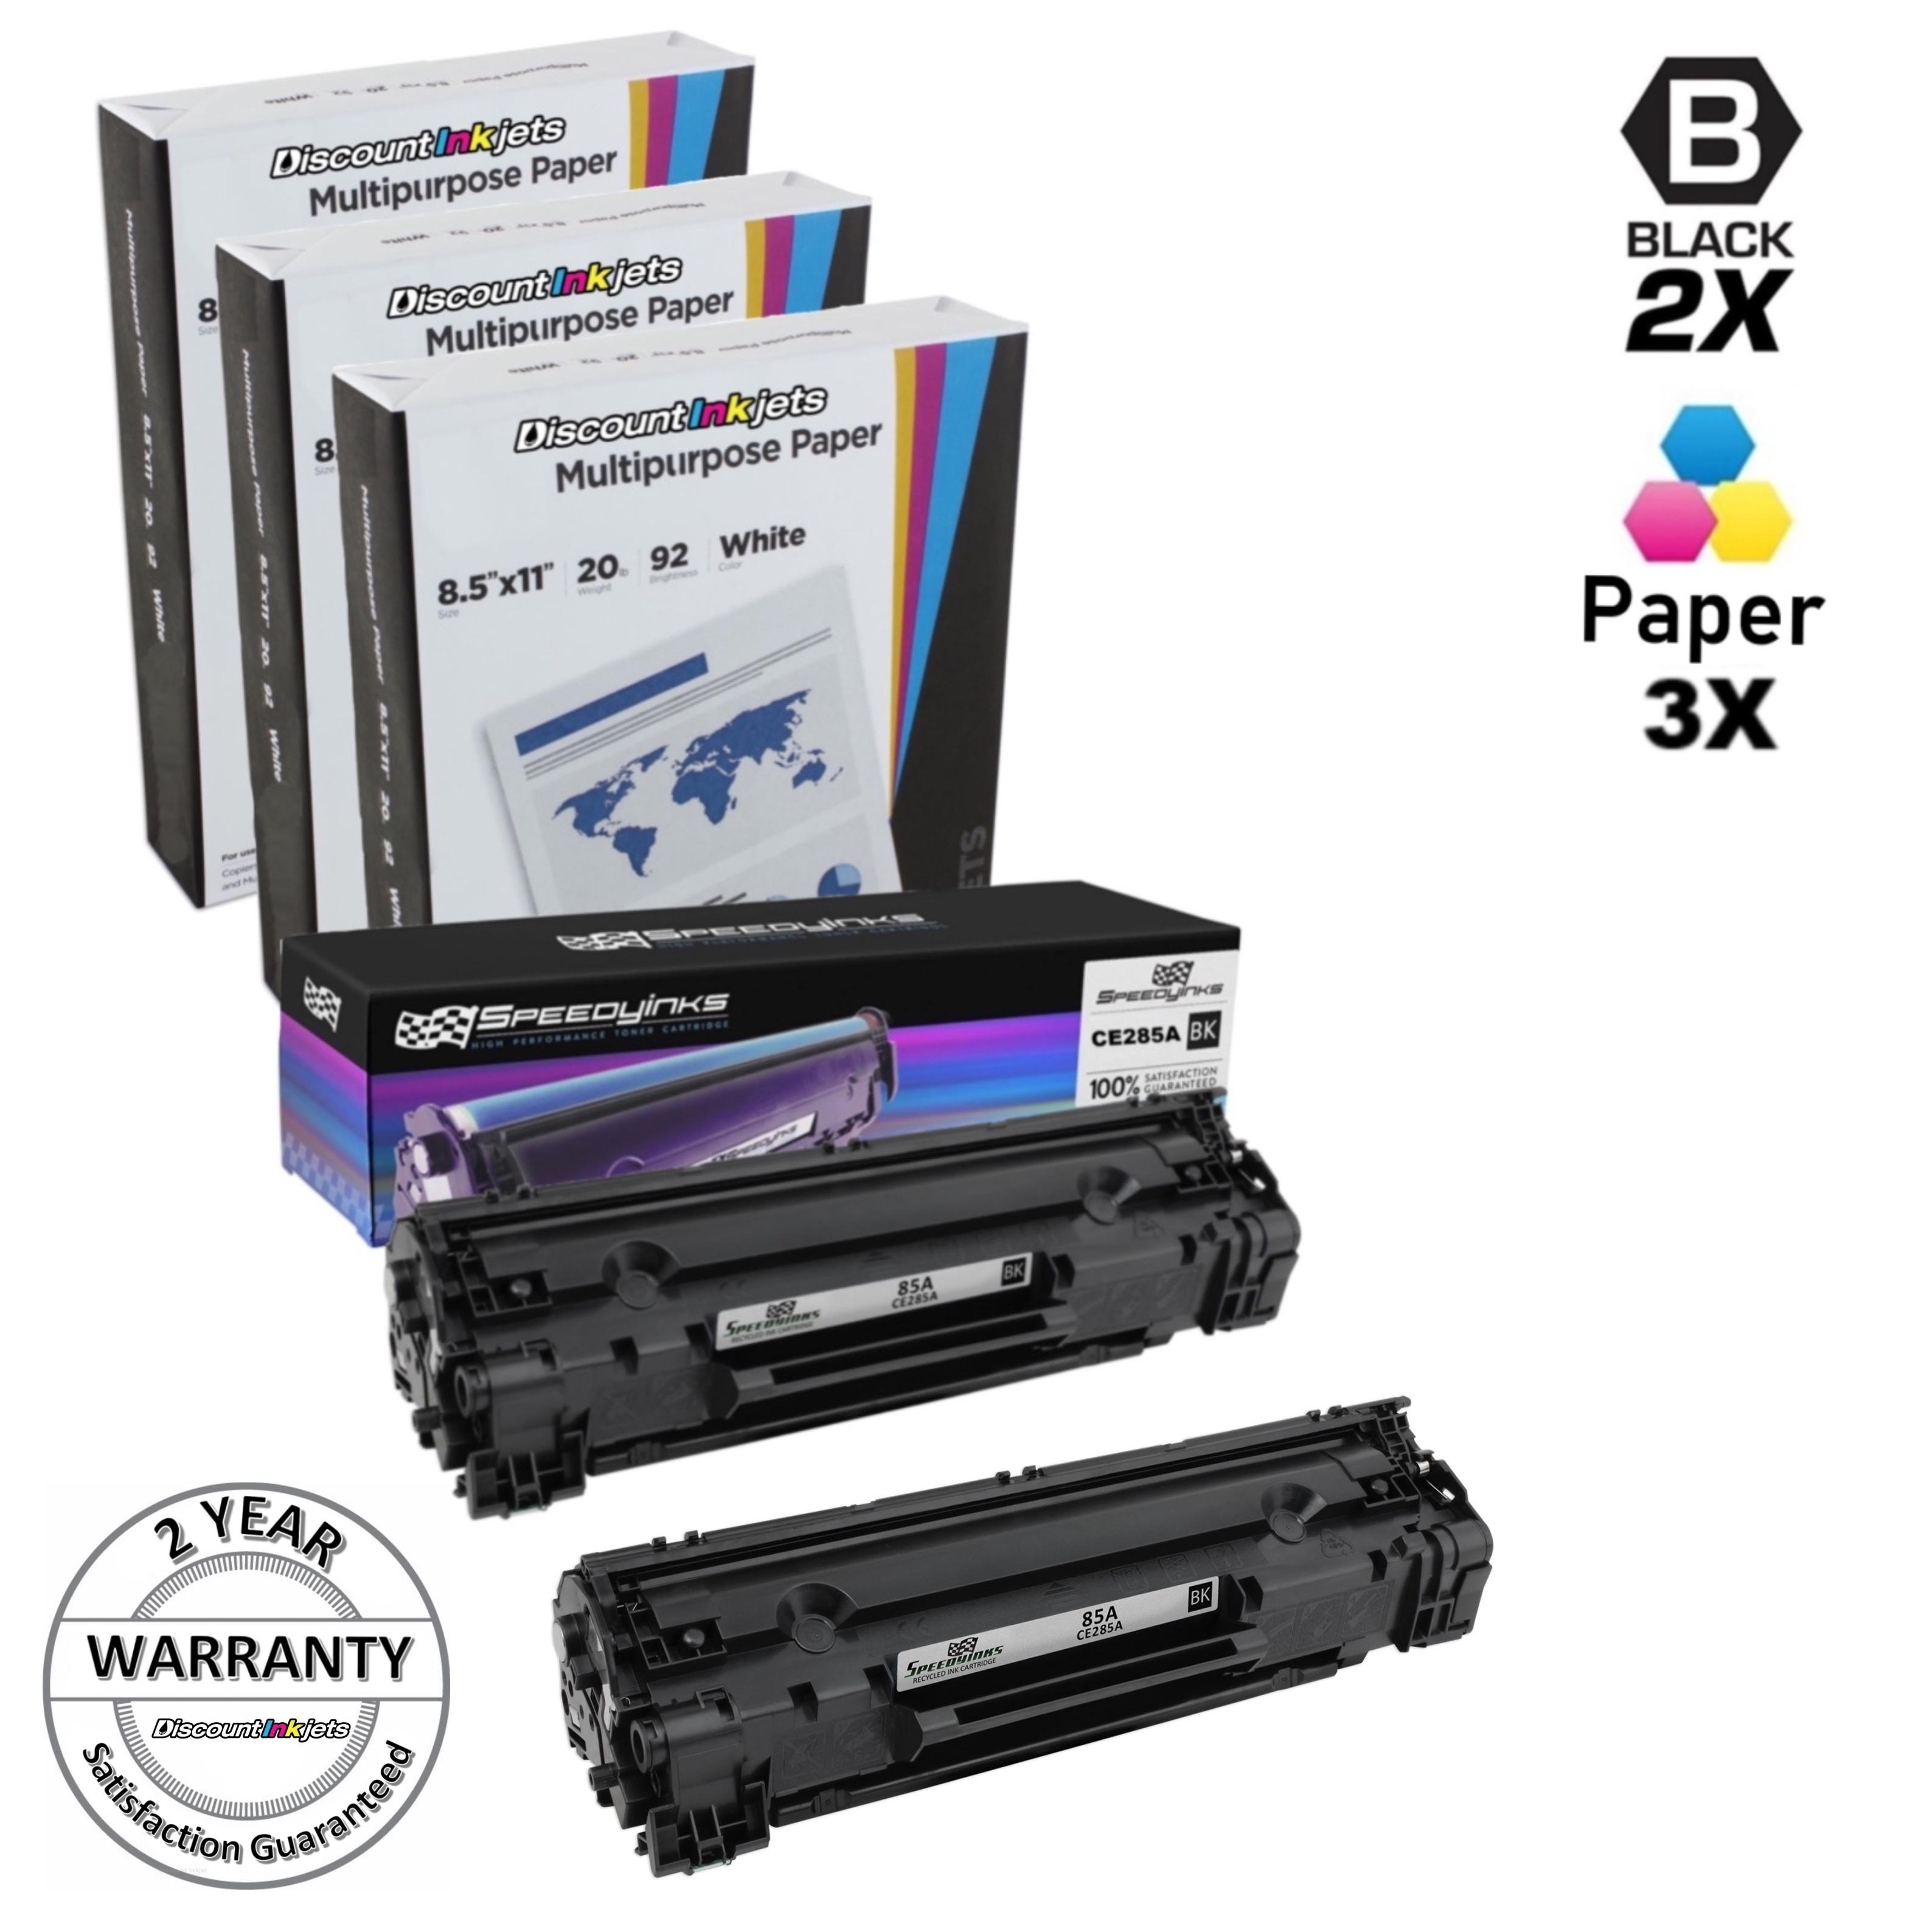 10 Pack Ce285a 85a Black Printer Toner Cartridge For Hp Laserjet Pro Opc Drum P1102 Katrid 2pk 3pk Paper